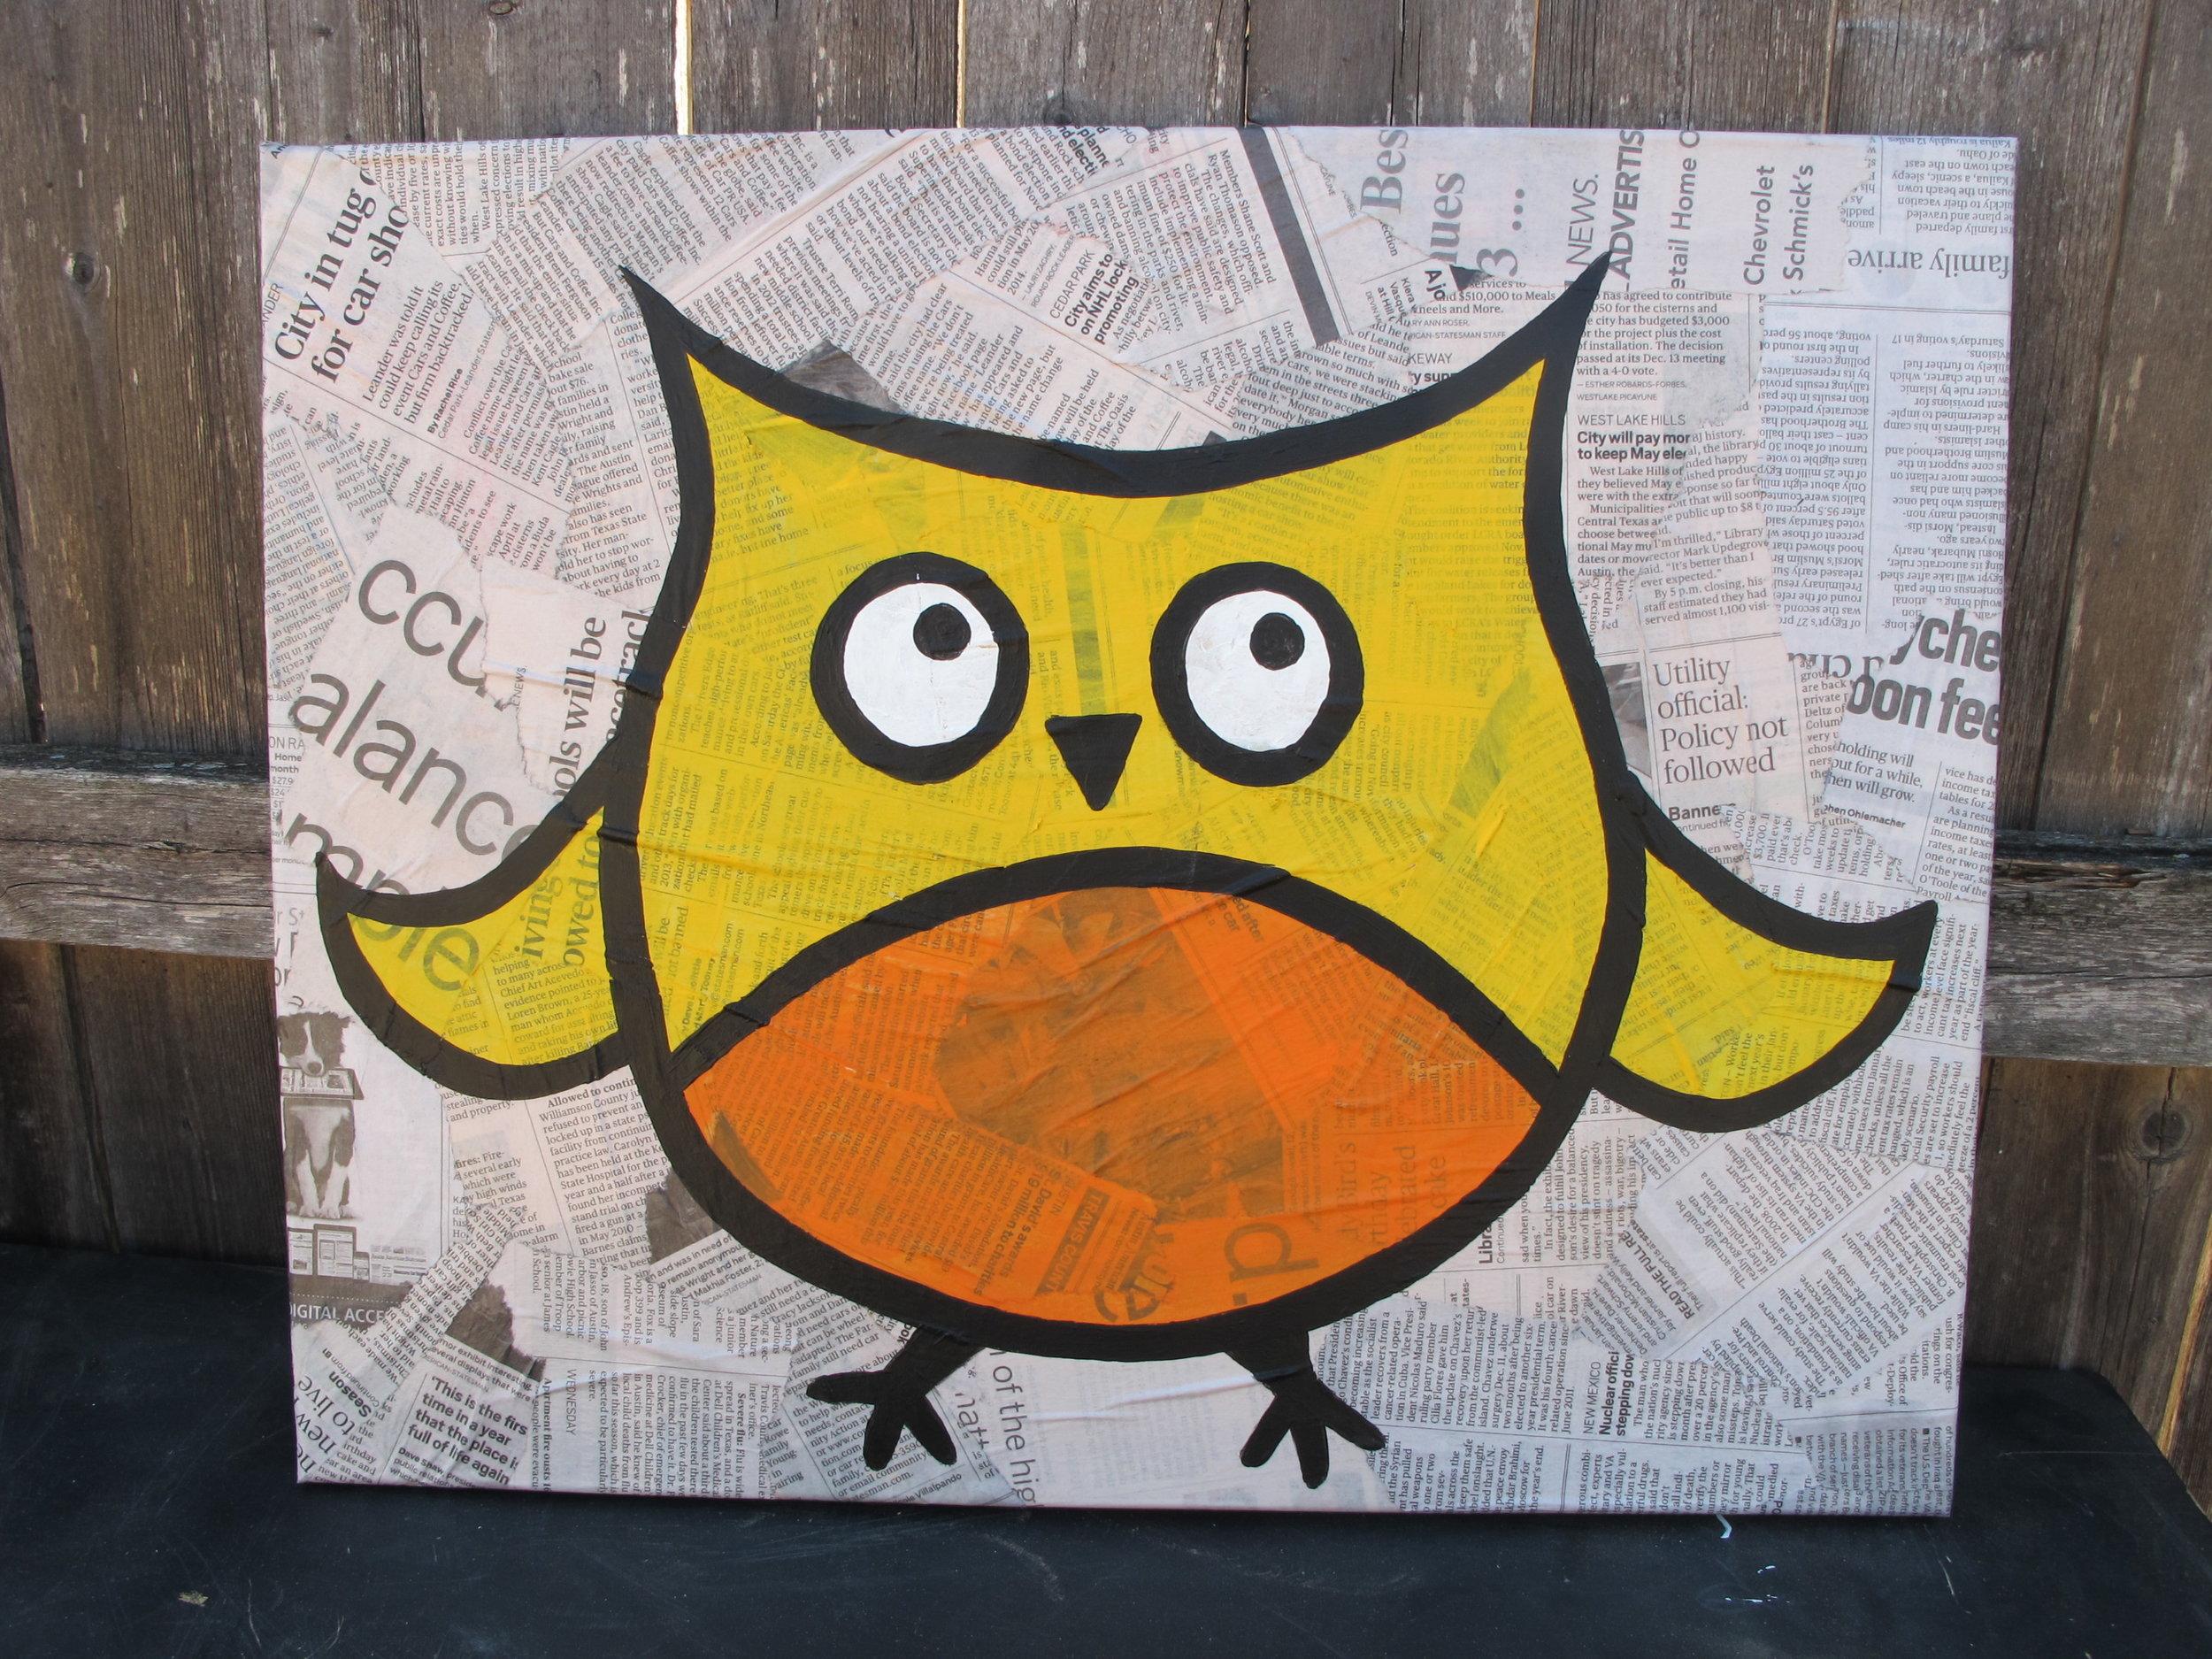 16x20 Owl on Newspaper - $50